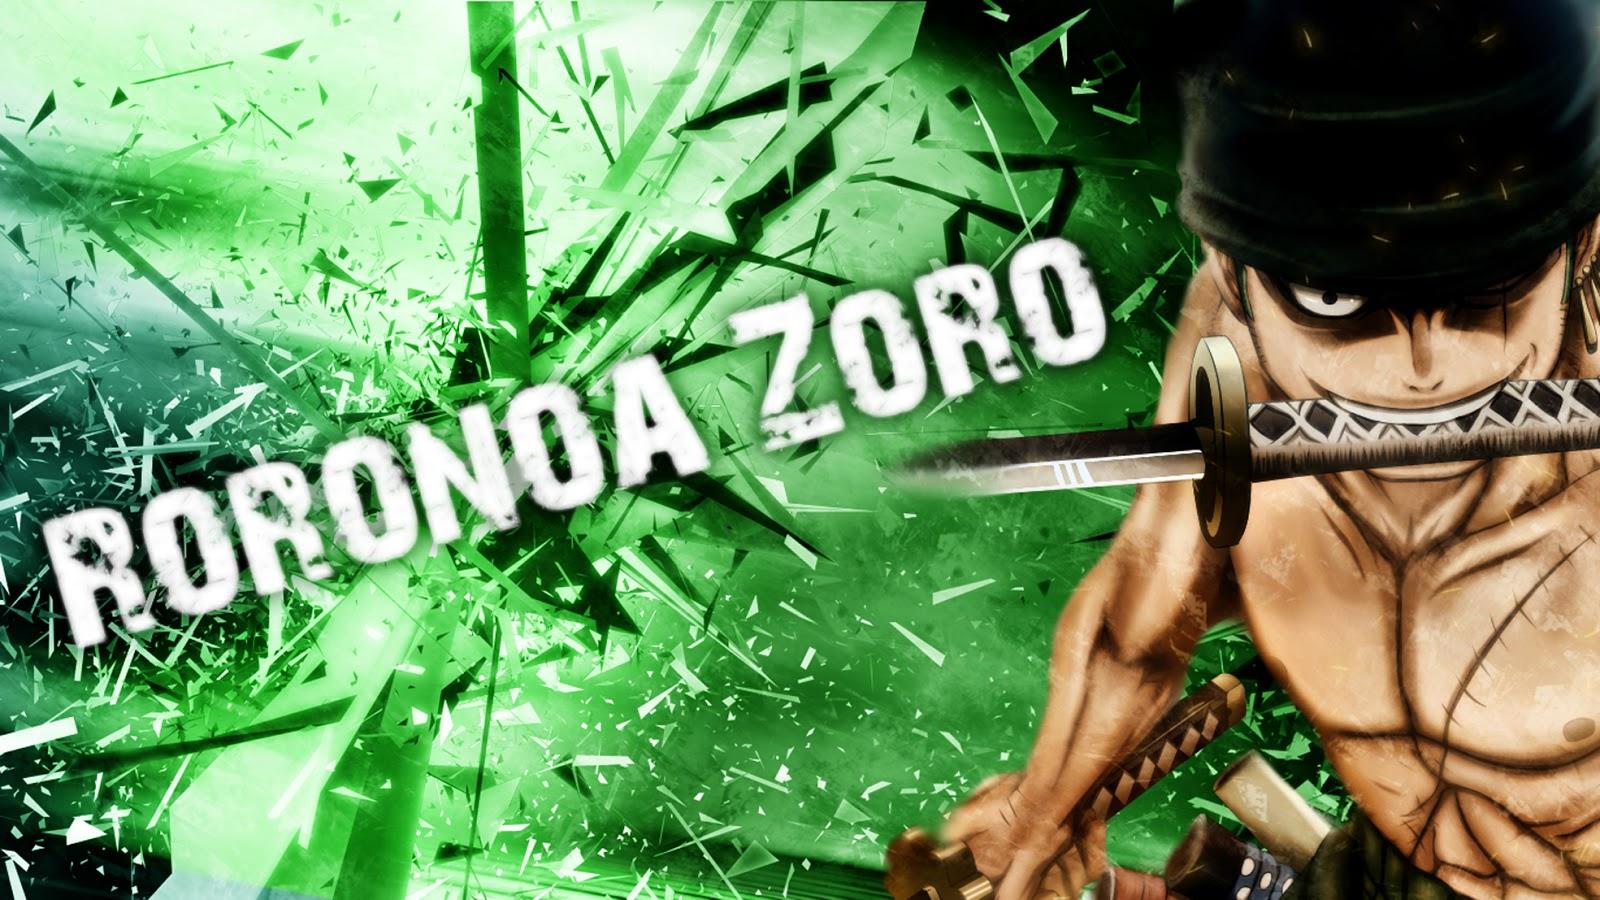 One Piece Zorro Wallpaper Roronoa Zoro New World Wallpaper Hd 1600x900 Download Hd Wallpaper Wallpapertip